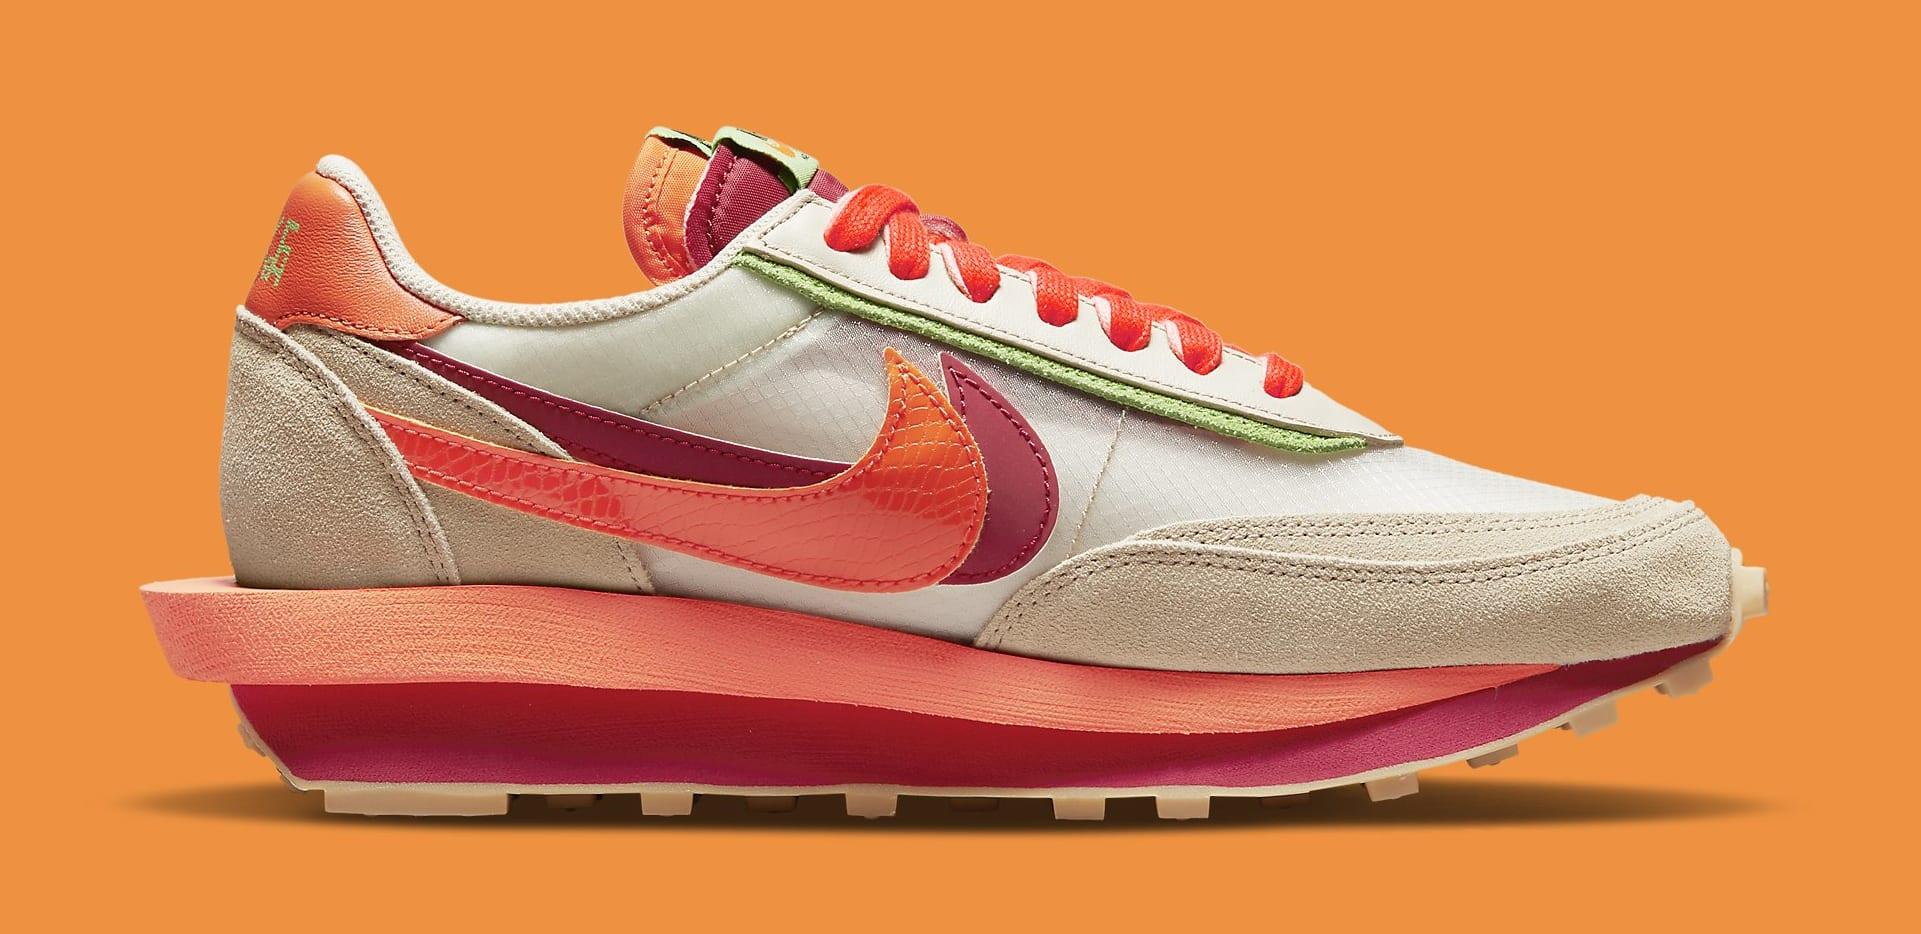 Sacai x Clot x Nike LDWaffle DH1347-100 Medial